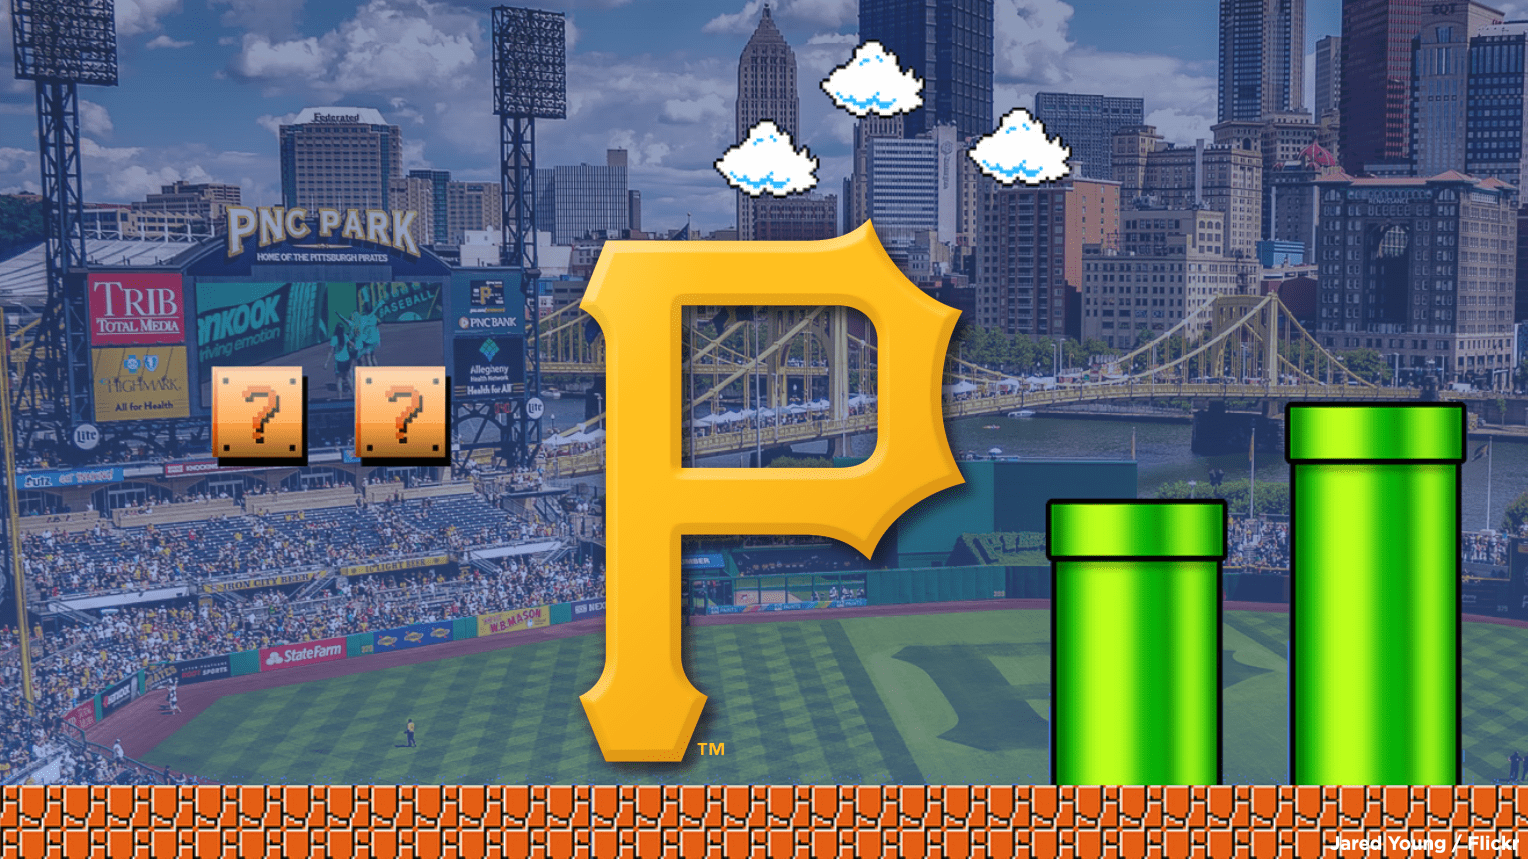 Pittsburgh Pirates' Super Bucco Run Leverages New Video